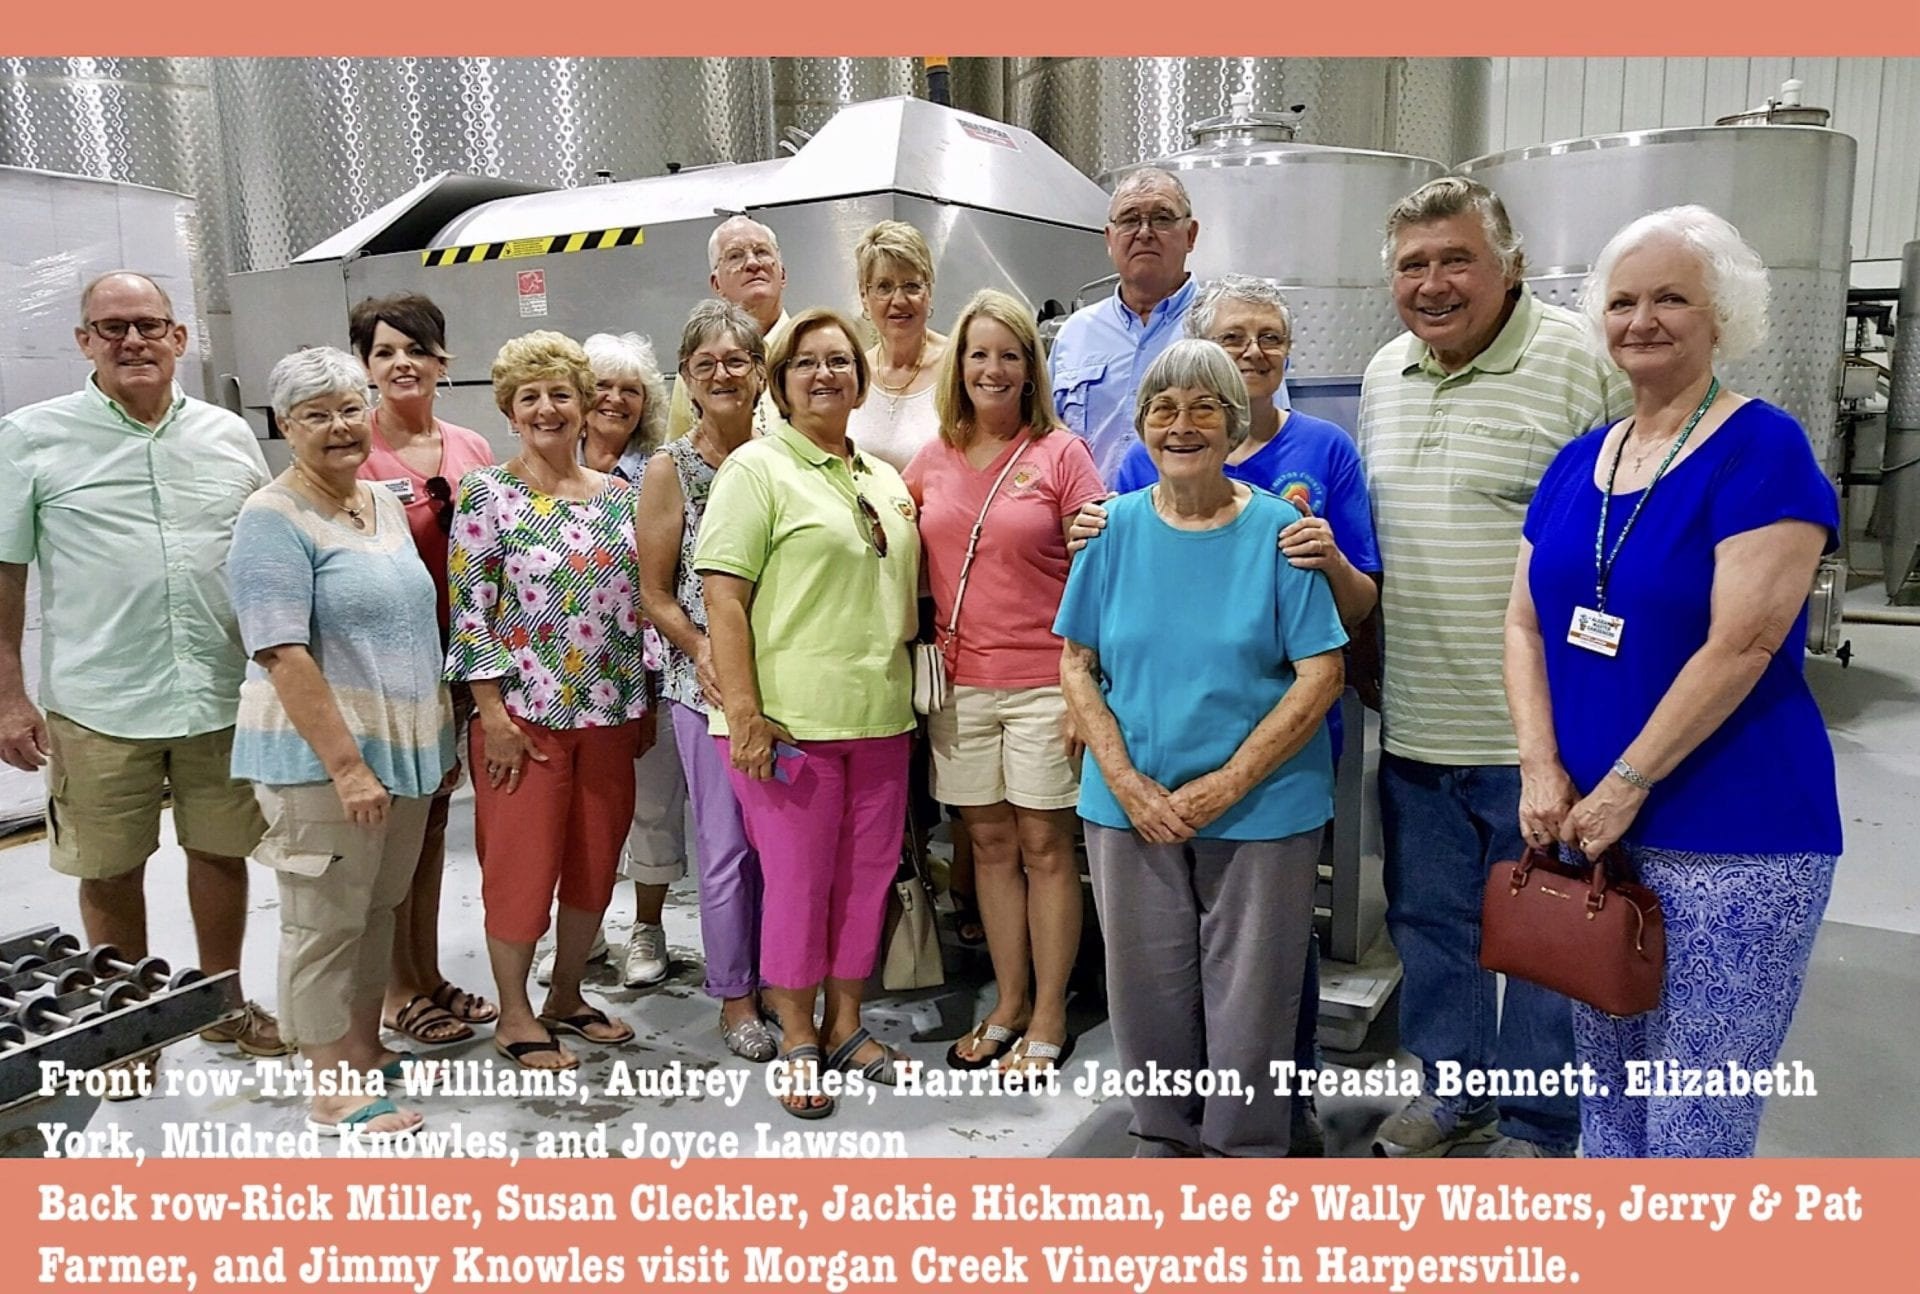 MG touring winery